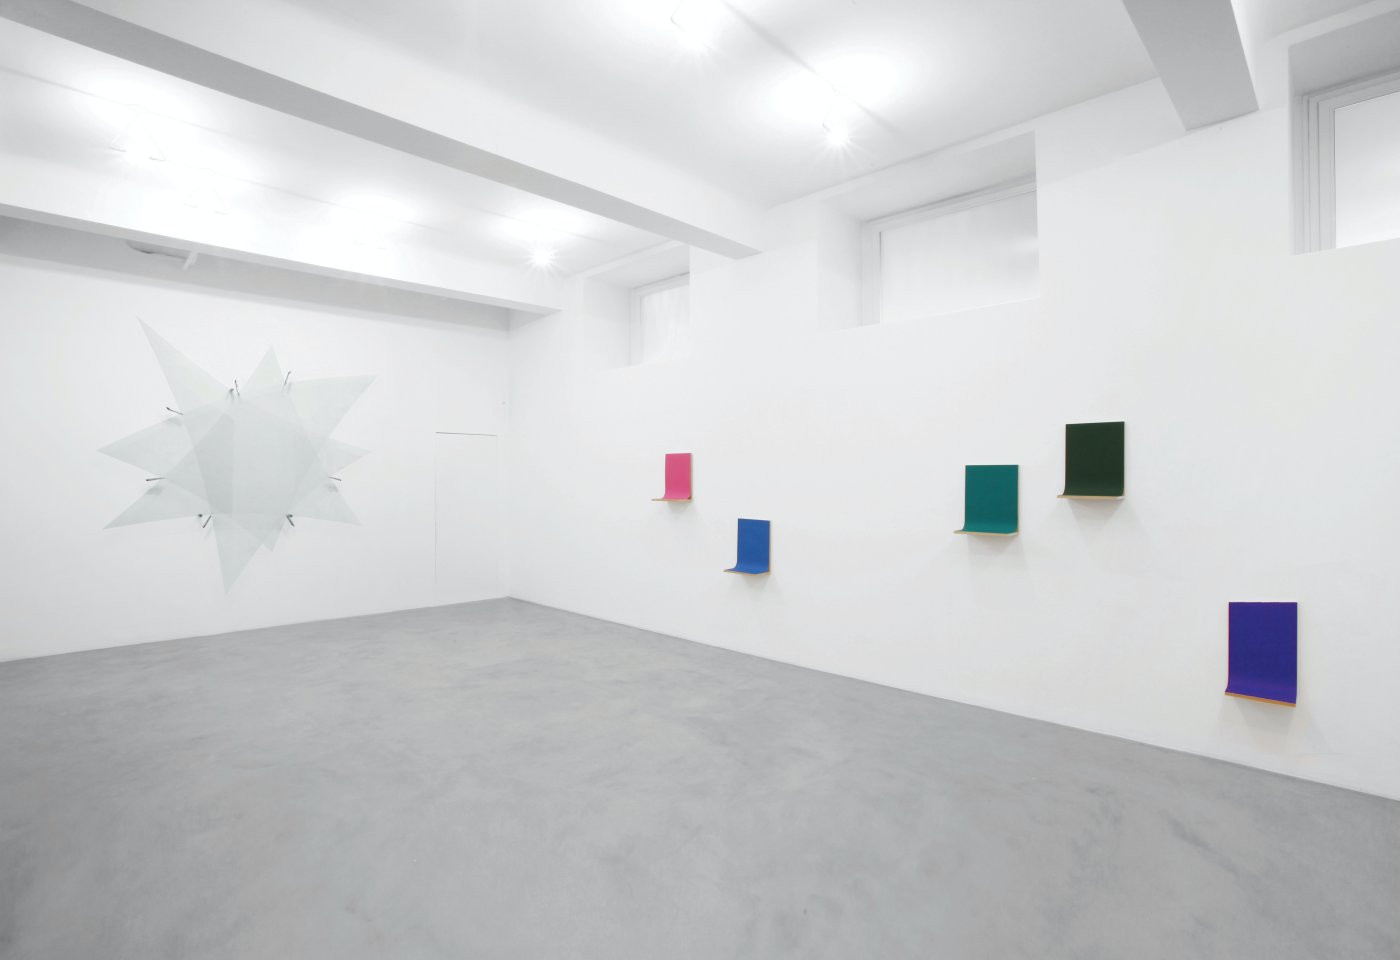 A Arte Invernizzi Sensitive spaces 9